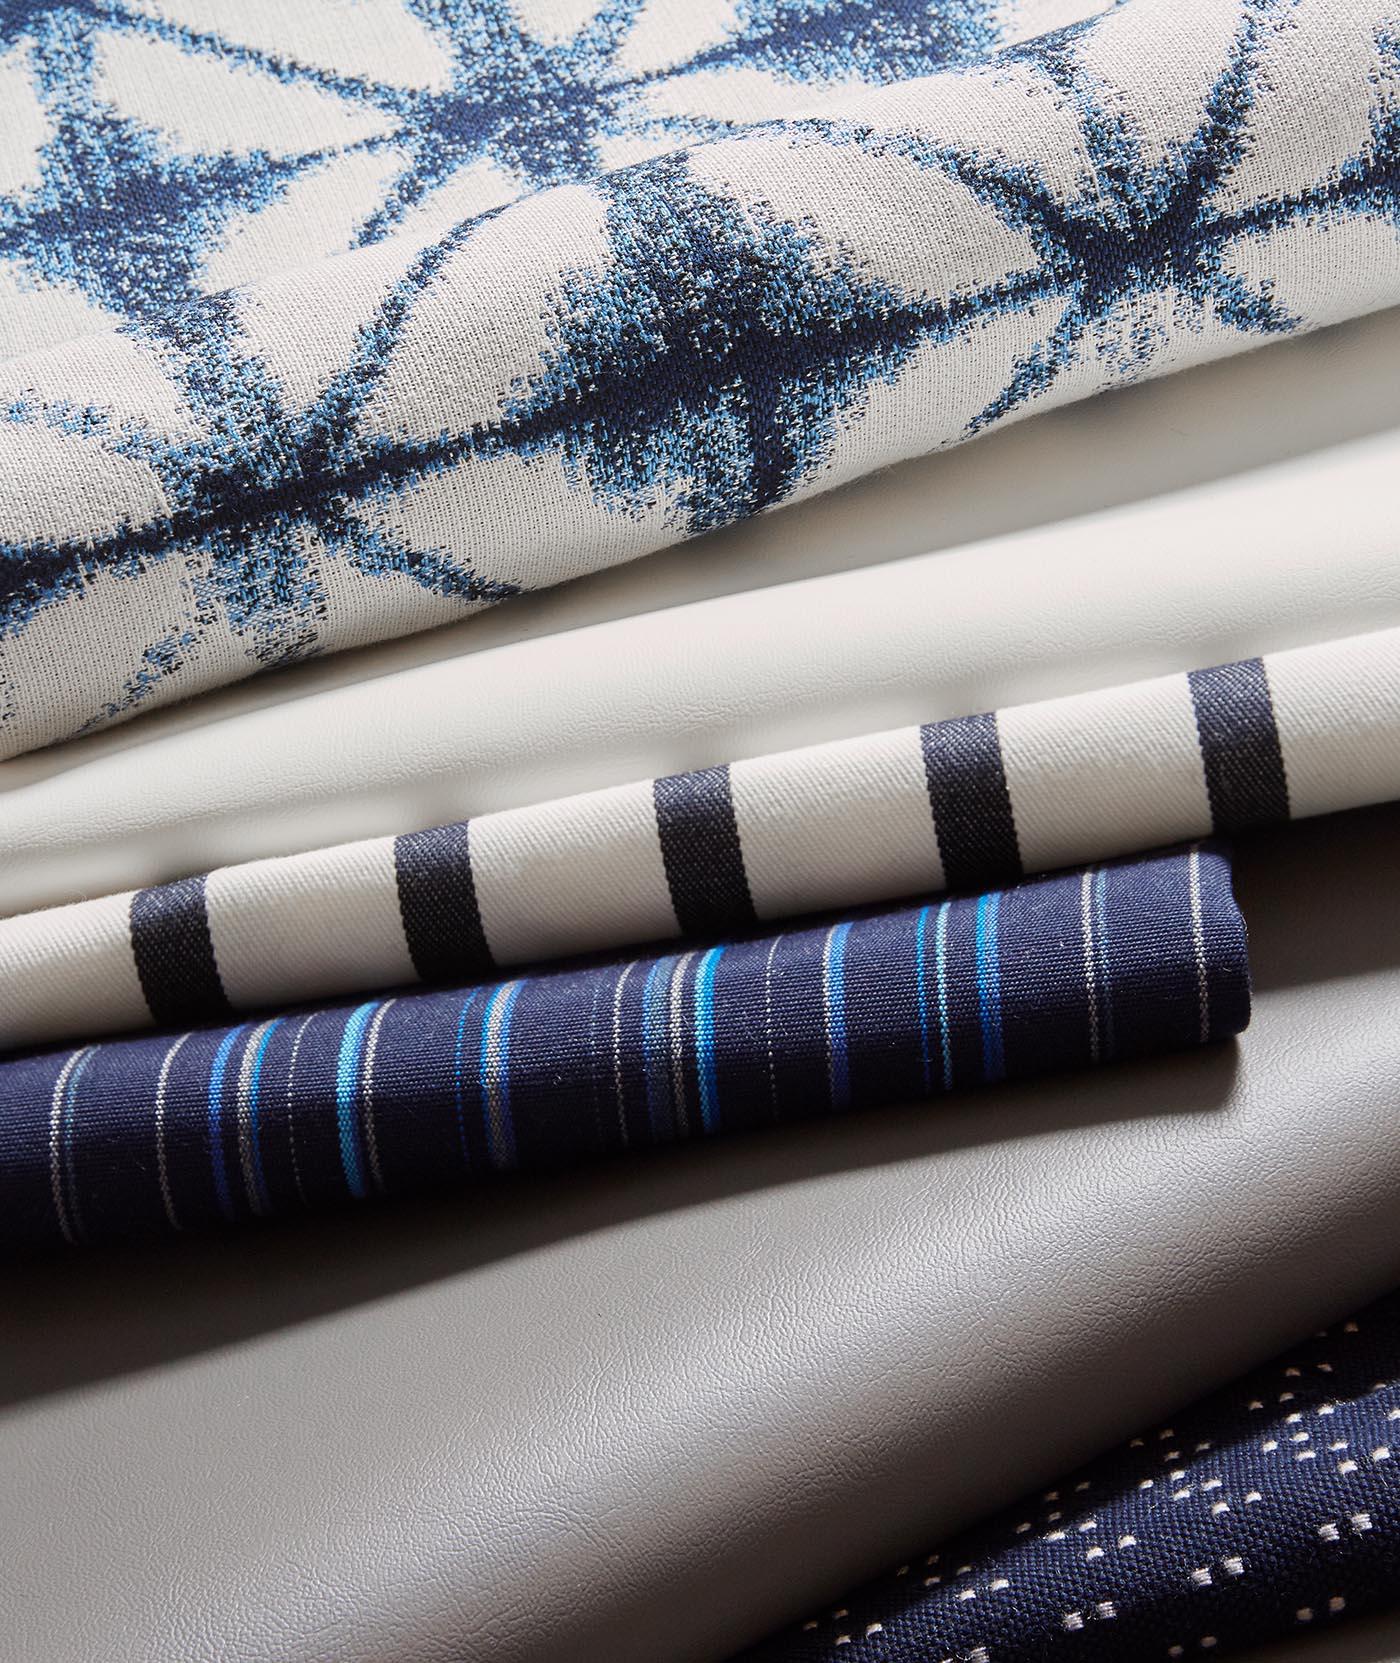 Sunbrella Marine Upholstery Collection, Blue Fabrics